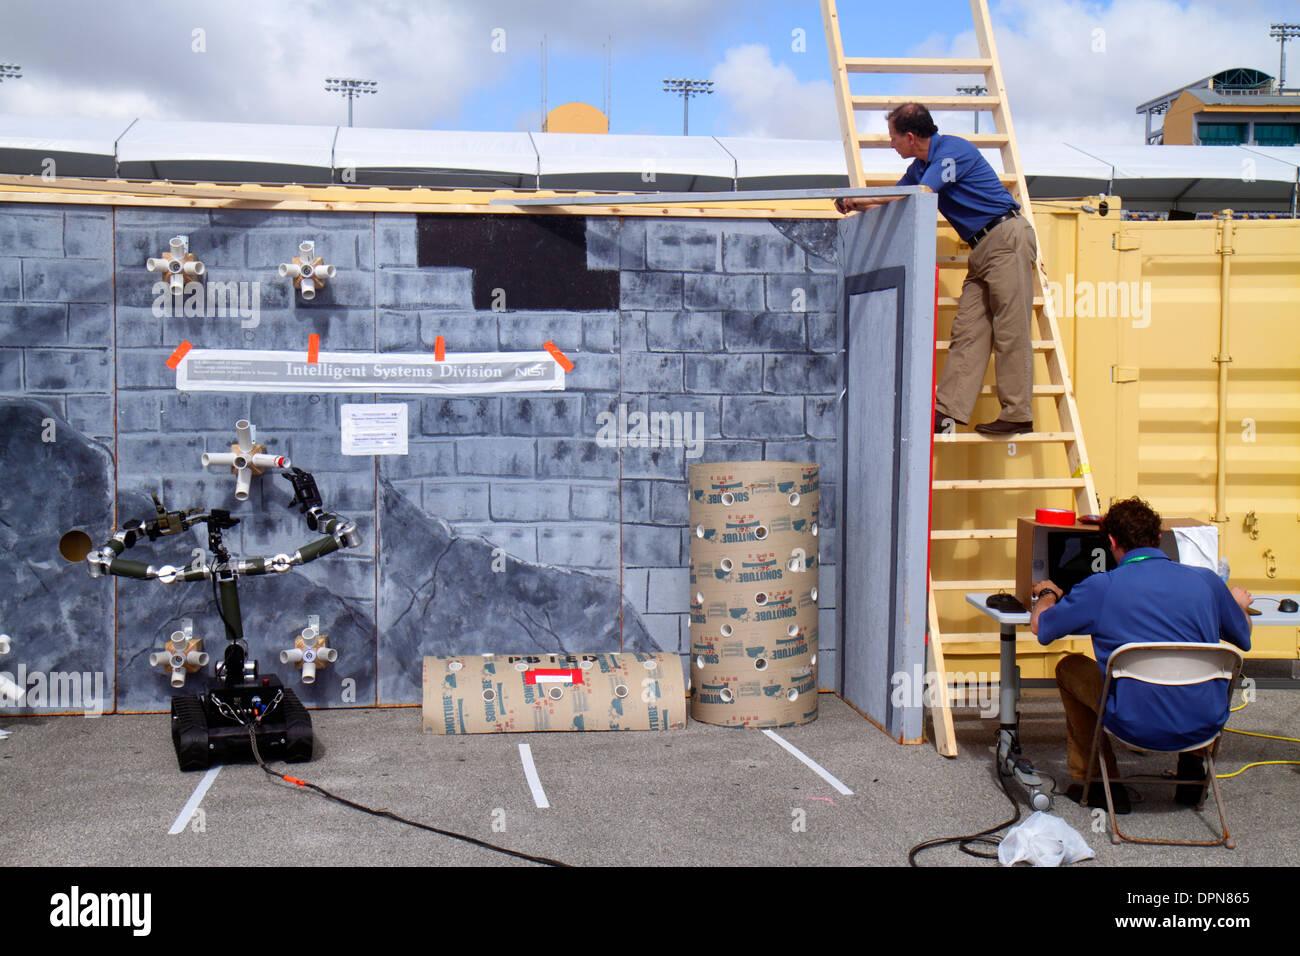 Miami Homestead Florida Speedway DARPA Robotics Challenge Trials remote controlled robot robots disaster response test - Stock Image